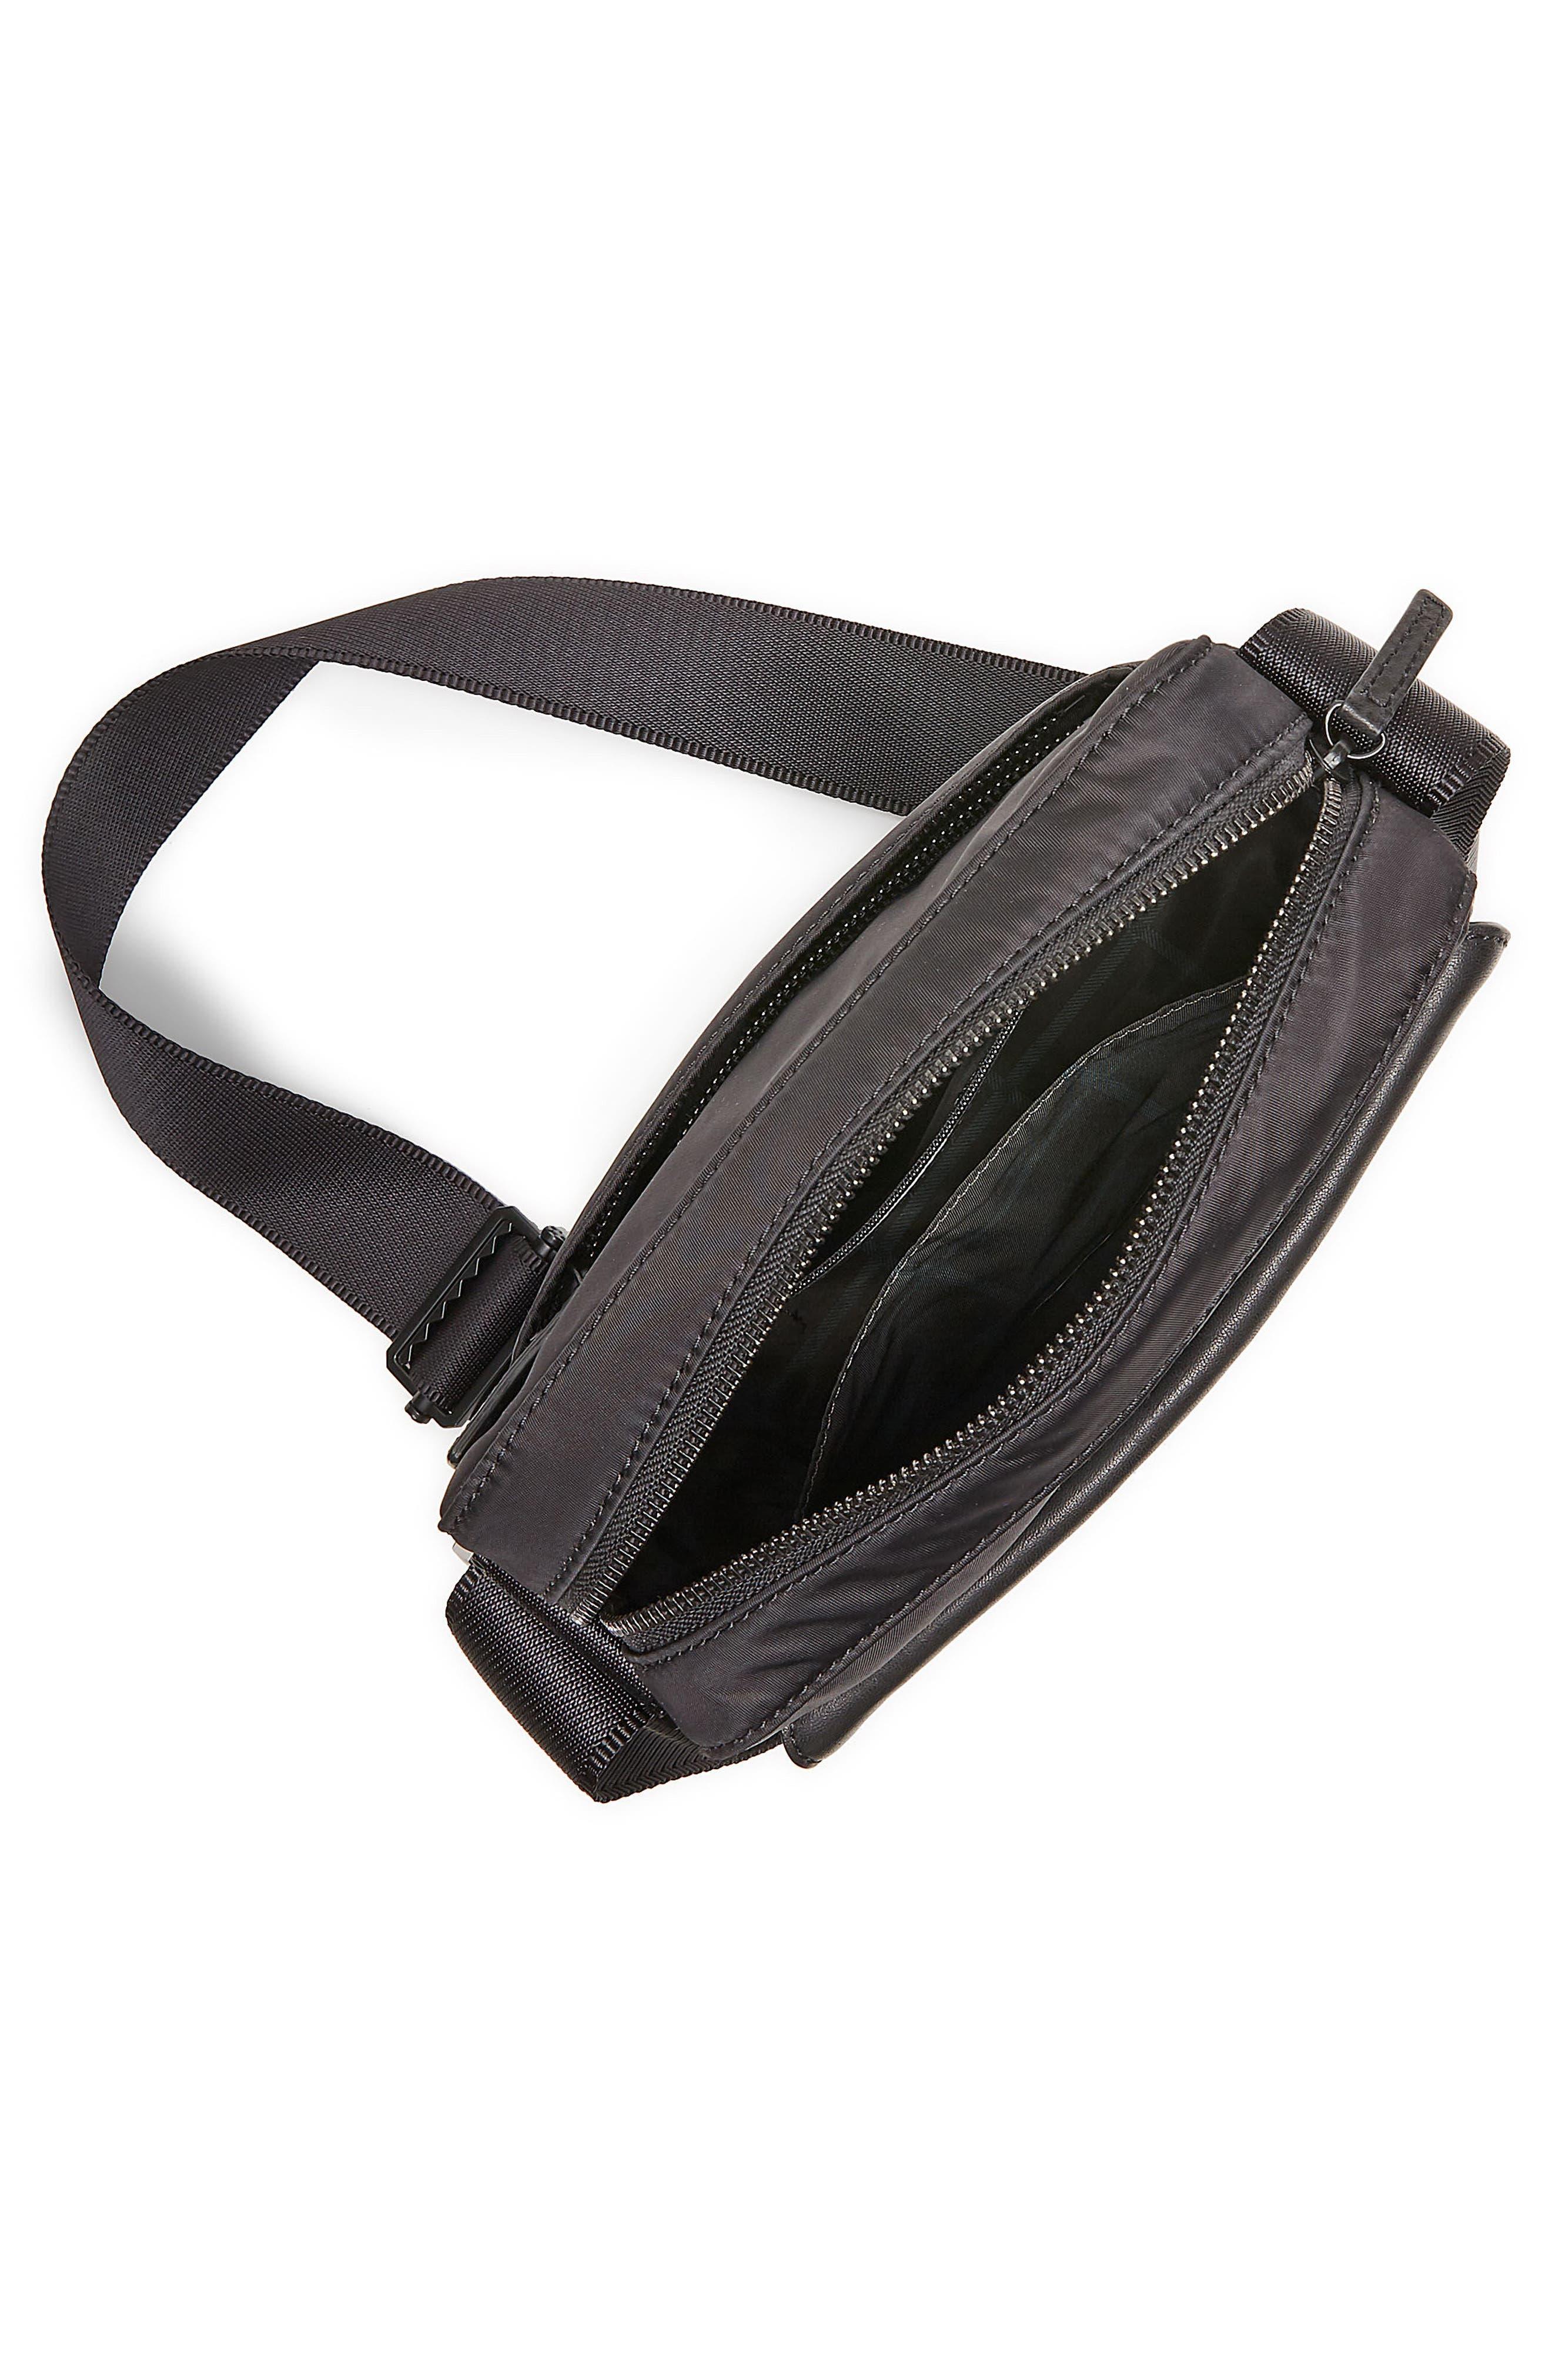 Basin Crossbody Bag,                             Alternate thumbnail 4, color,                             Black